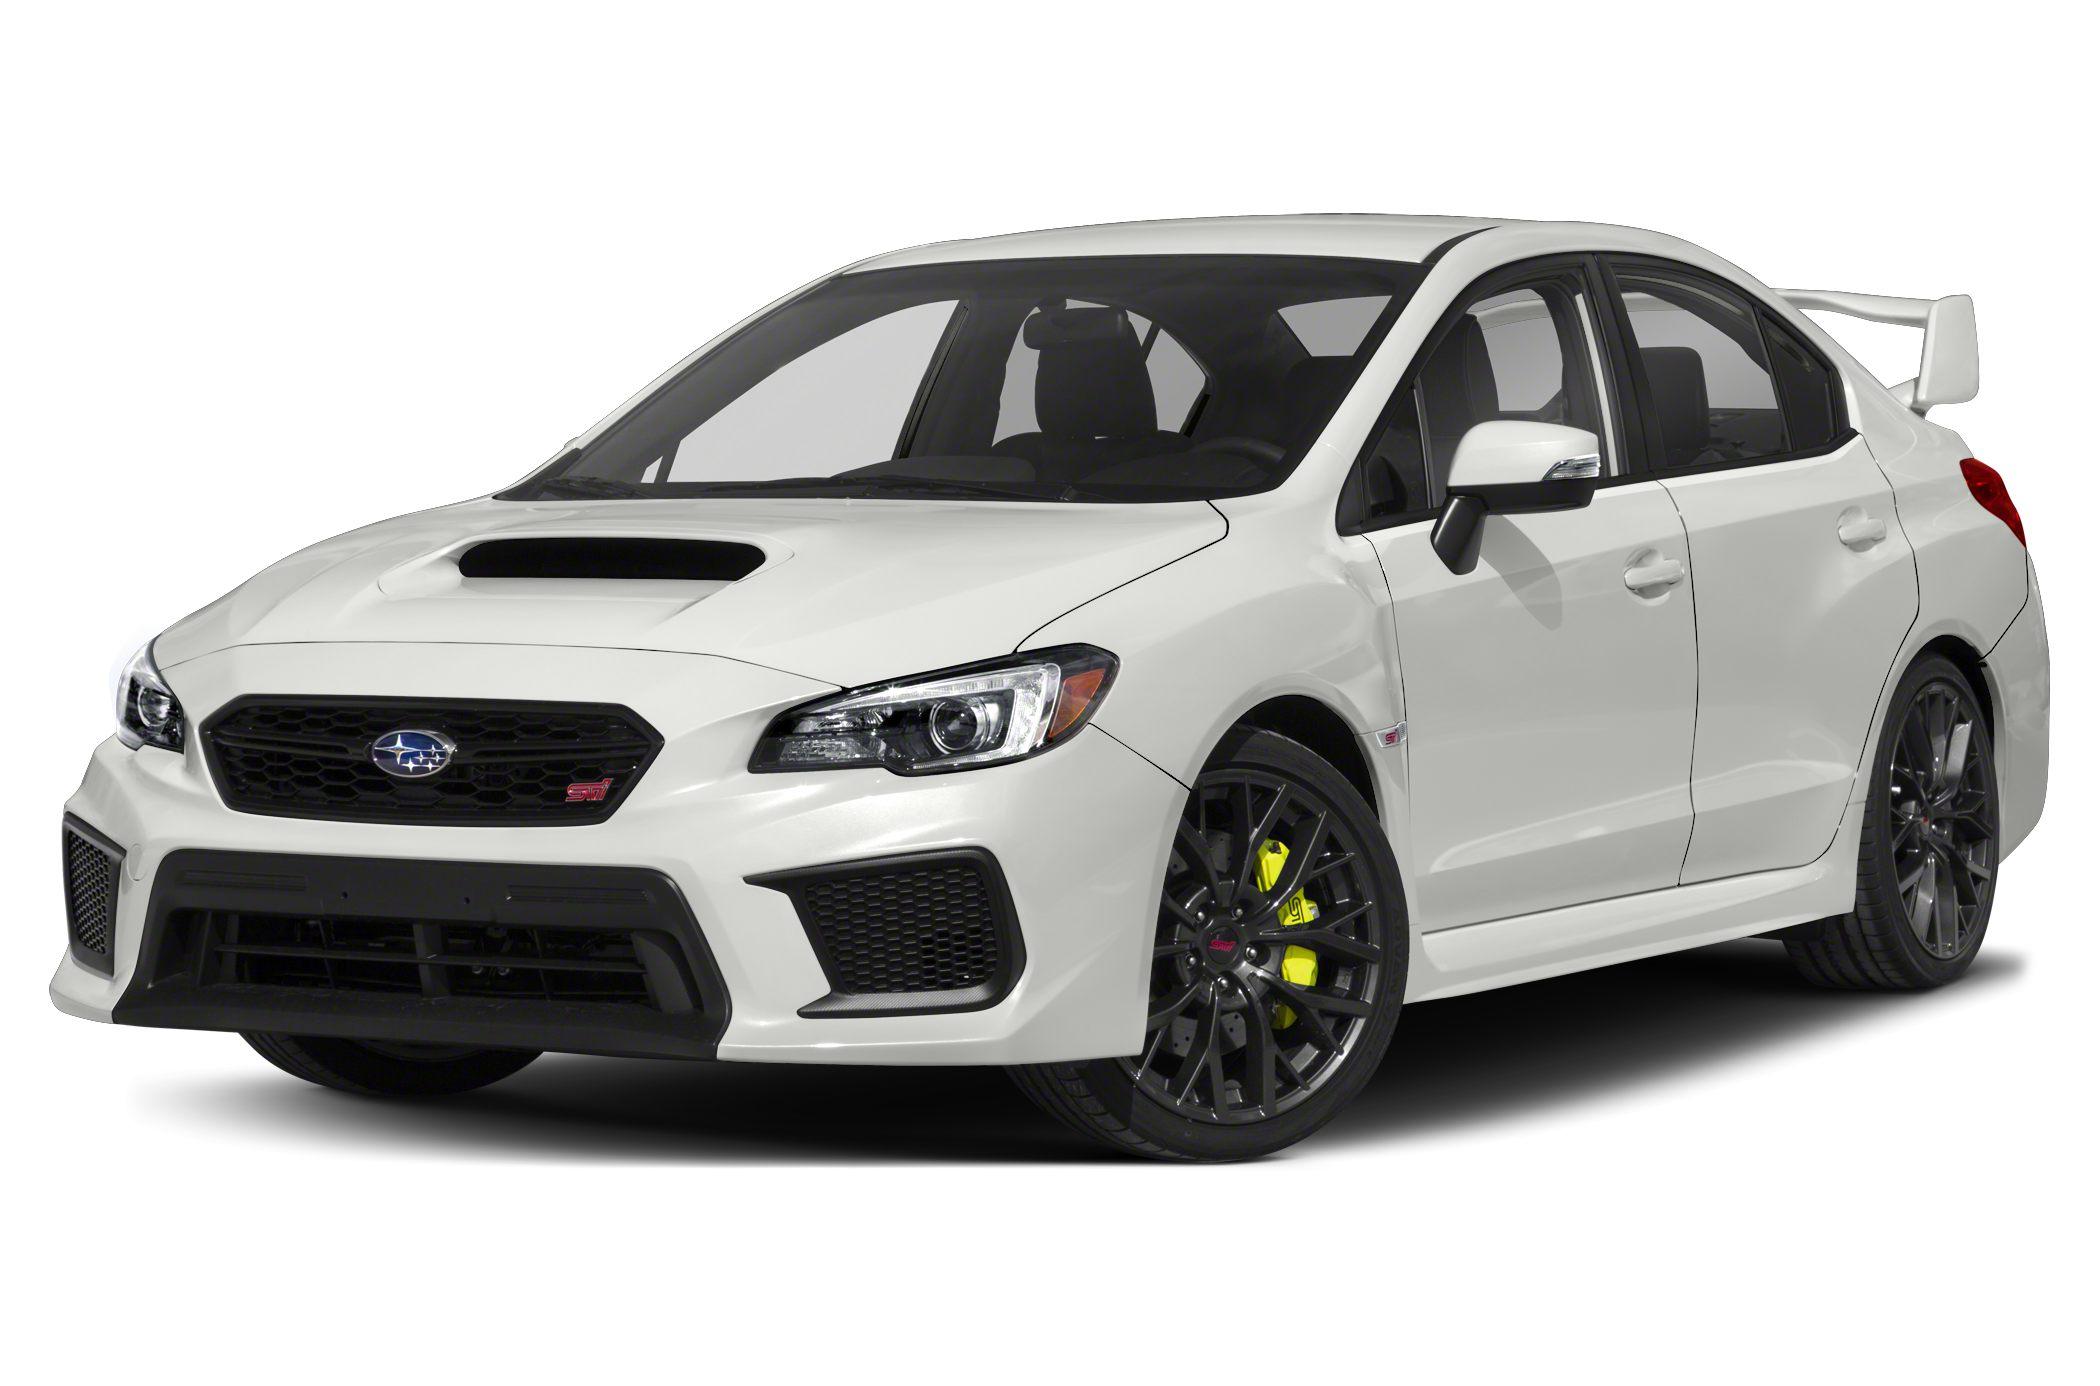 Subaru Wrx Sti Pricing Reviews And New Model Information